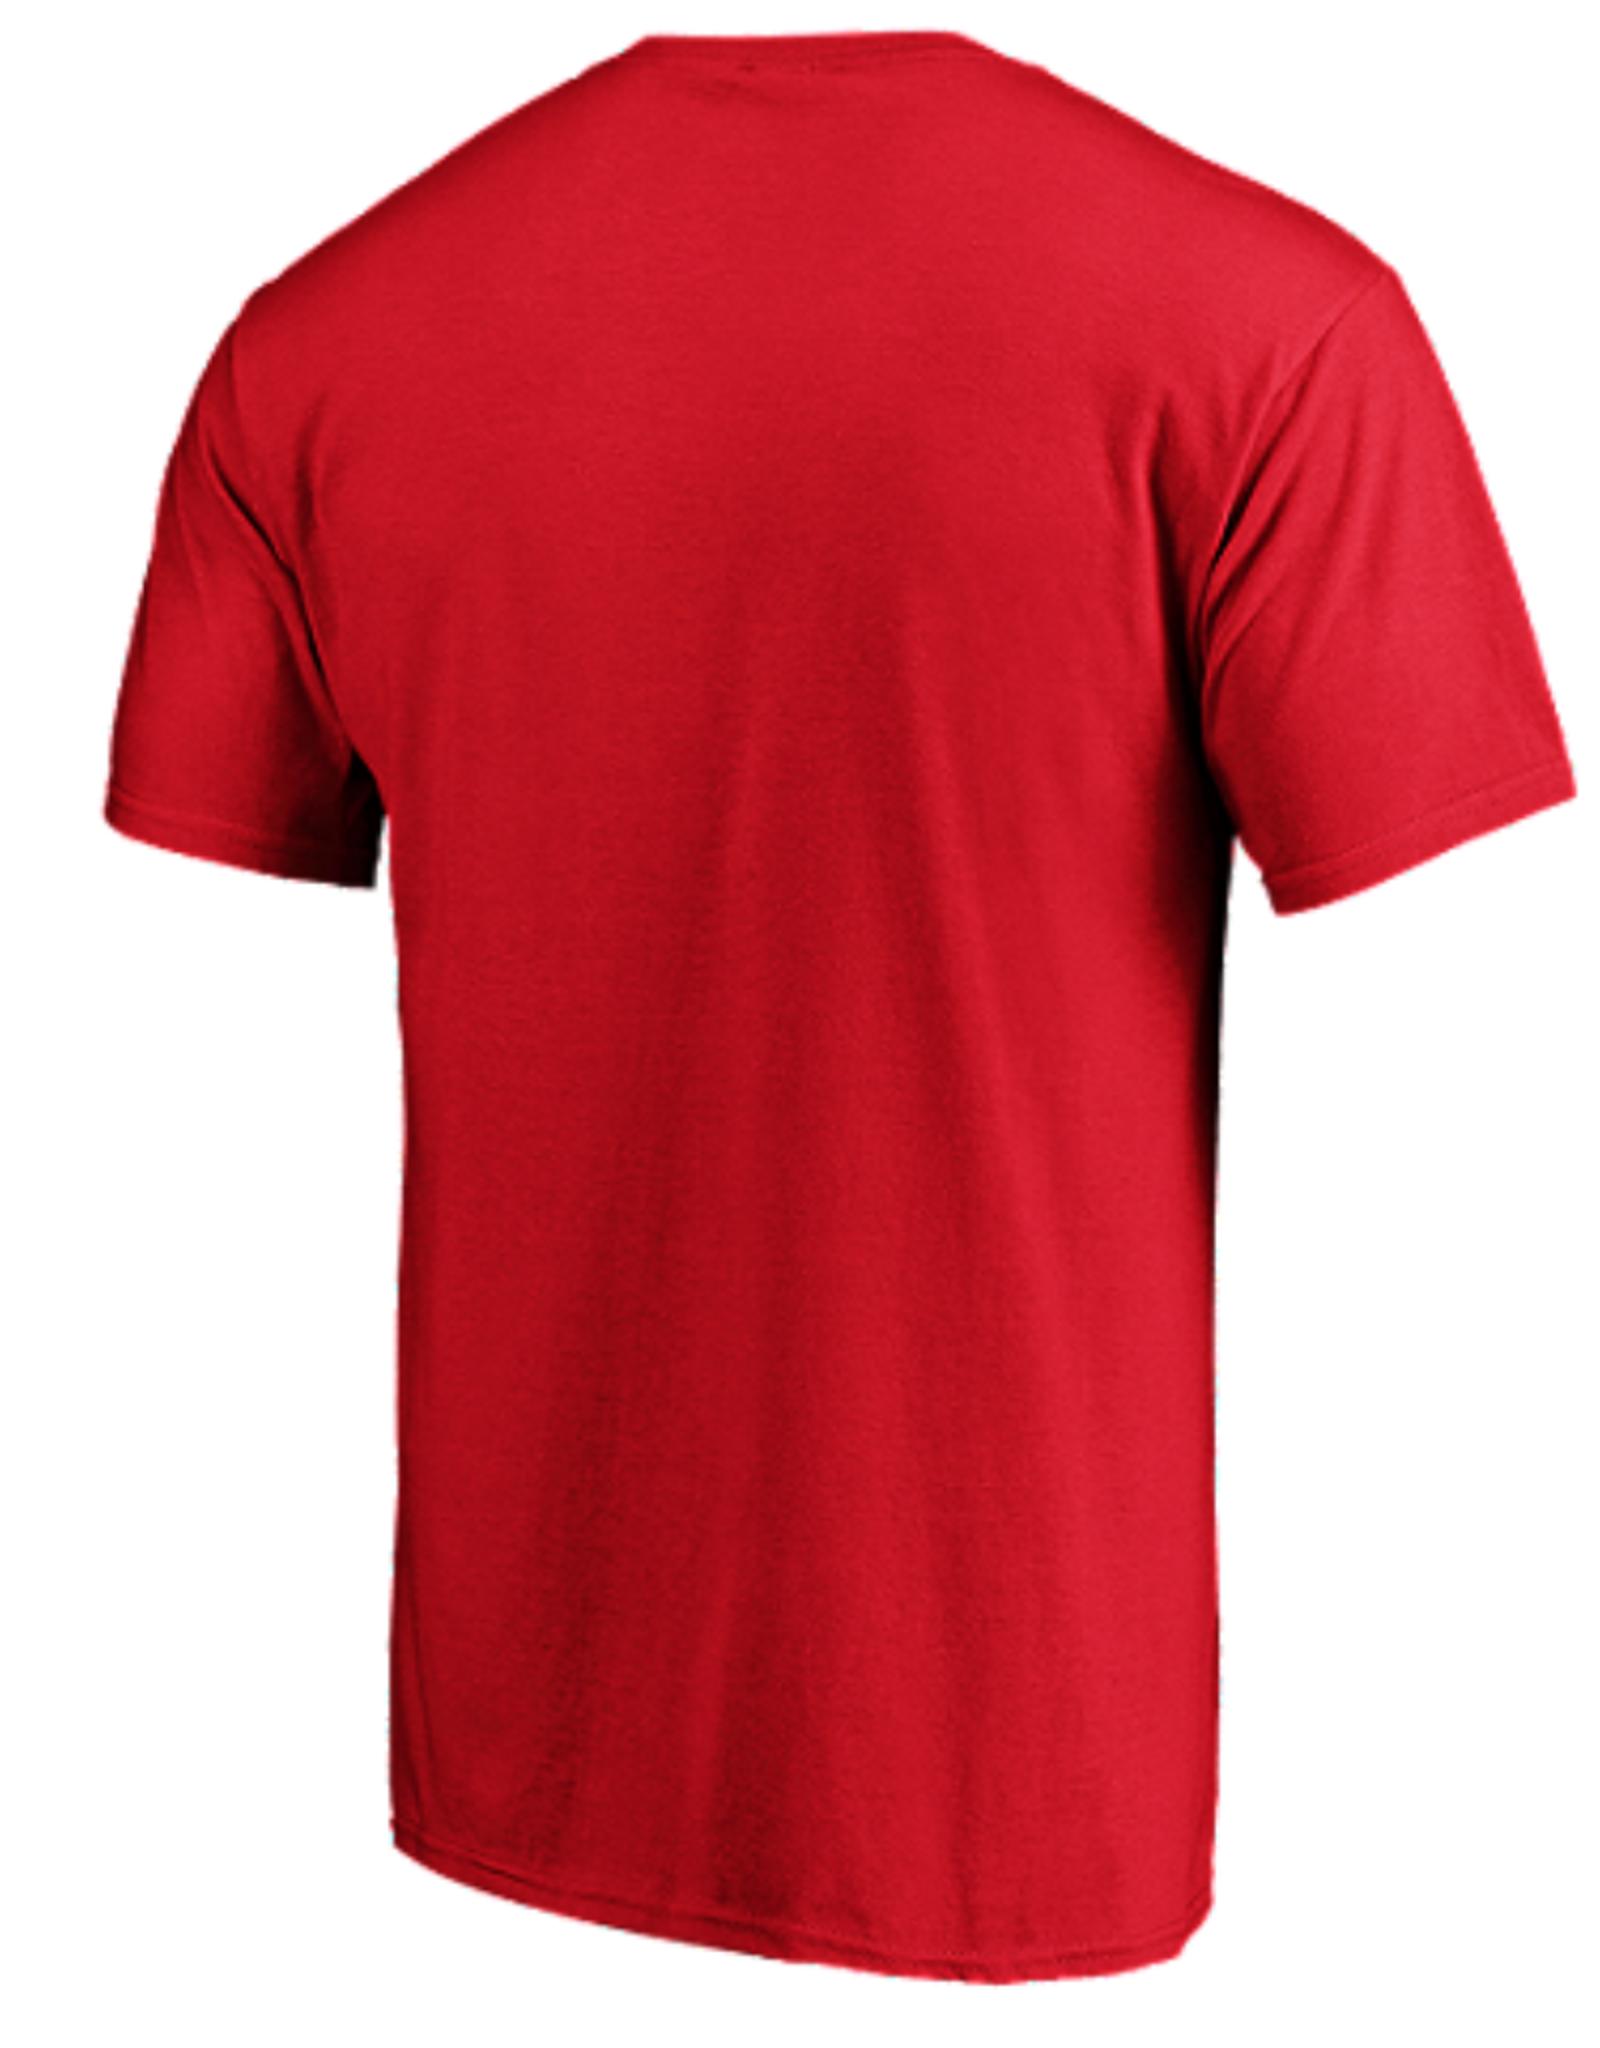 Fanatics Fanatics Men's Authentic Pro Prime T-Shirt Calgary Flames Red